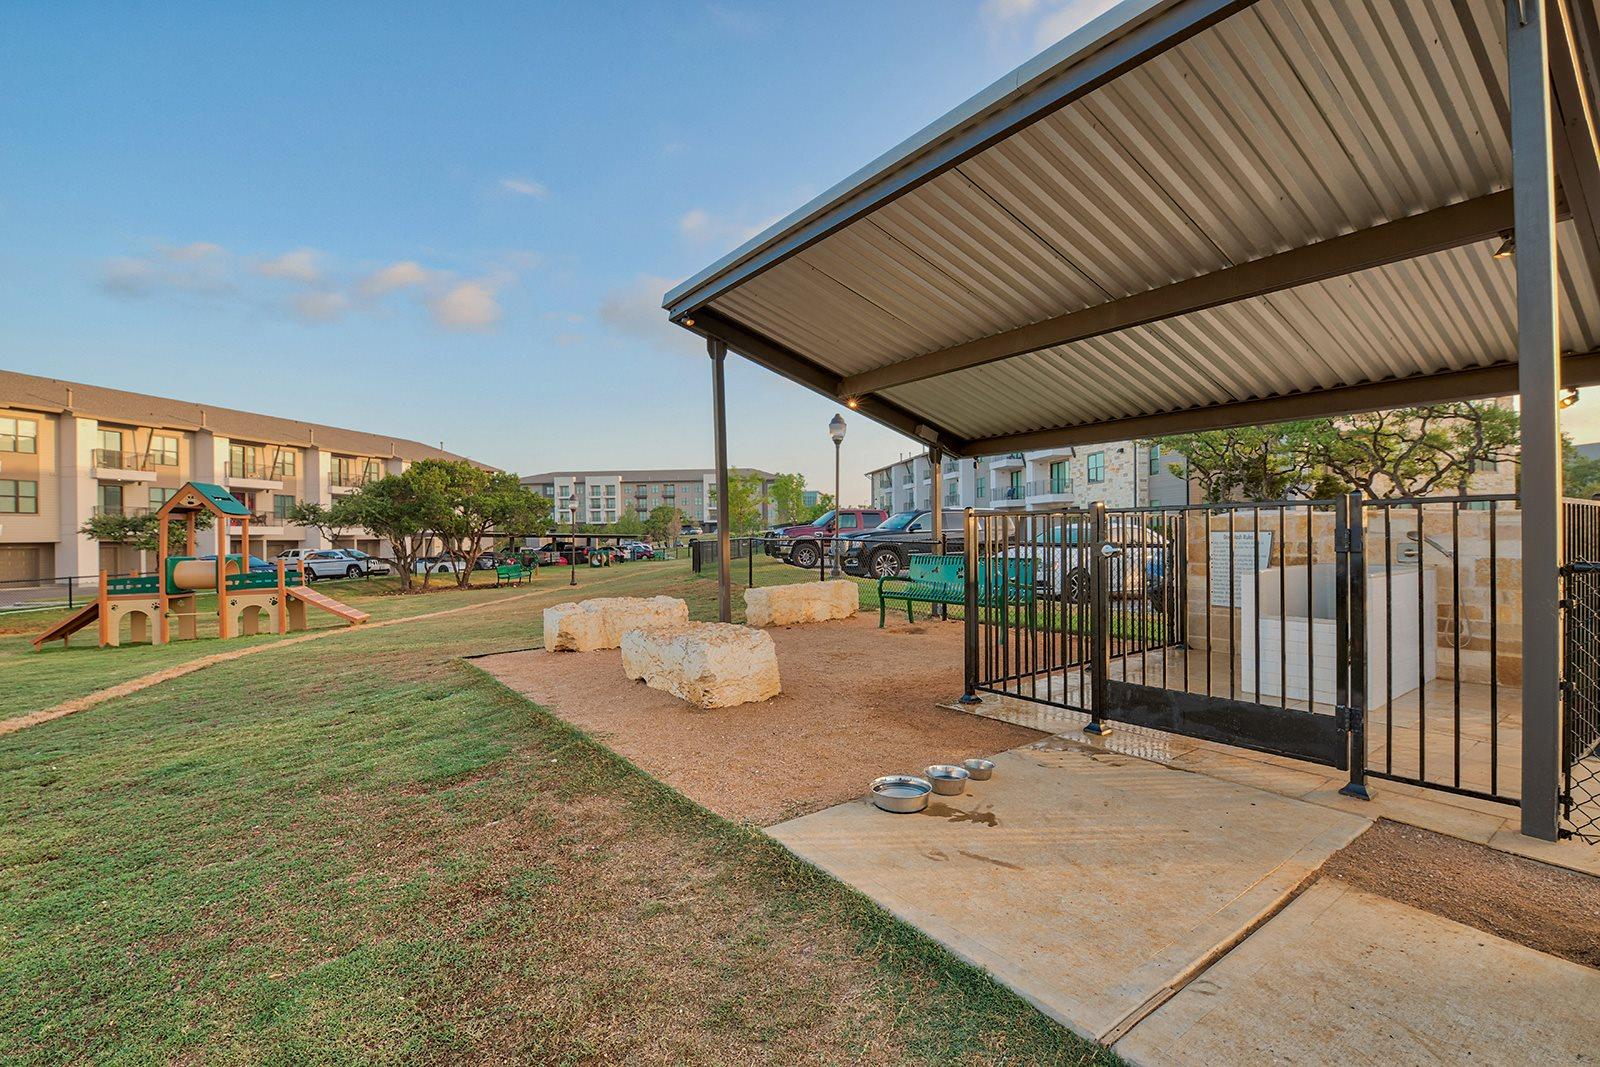 Off-Leash Dog Park at Windsor Lantana Hills, 6601 Rialto Blvd, TX